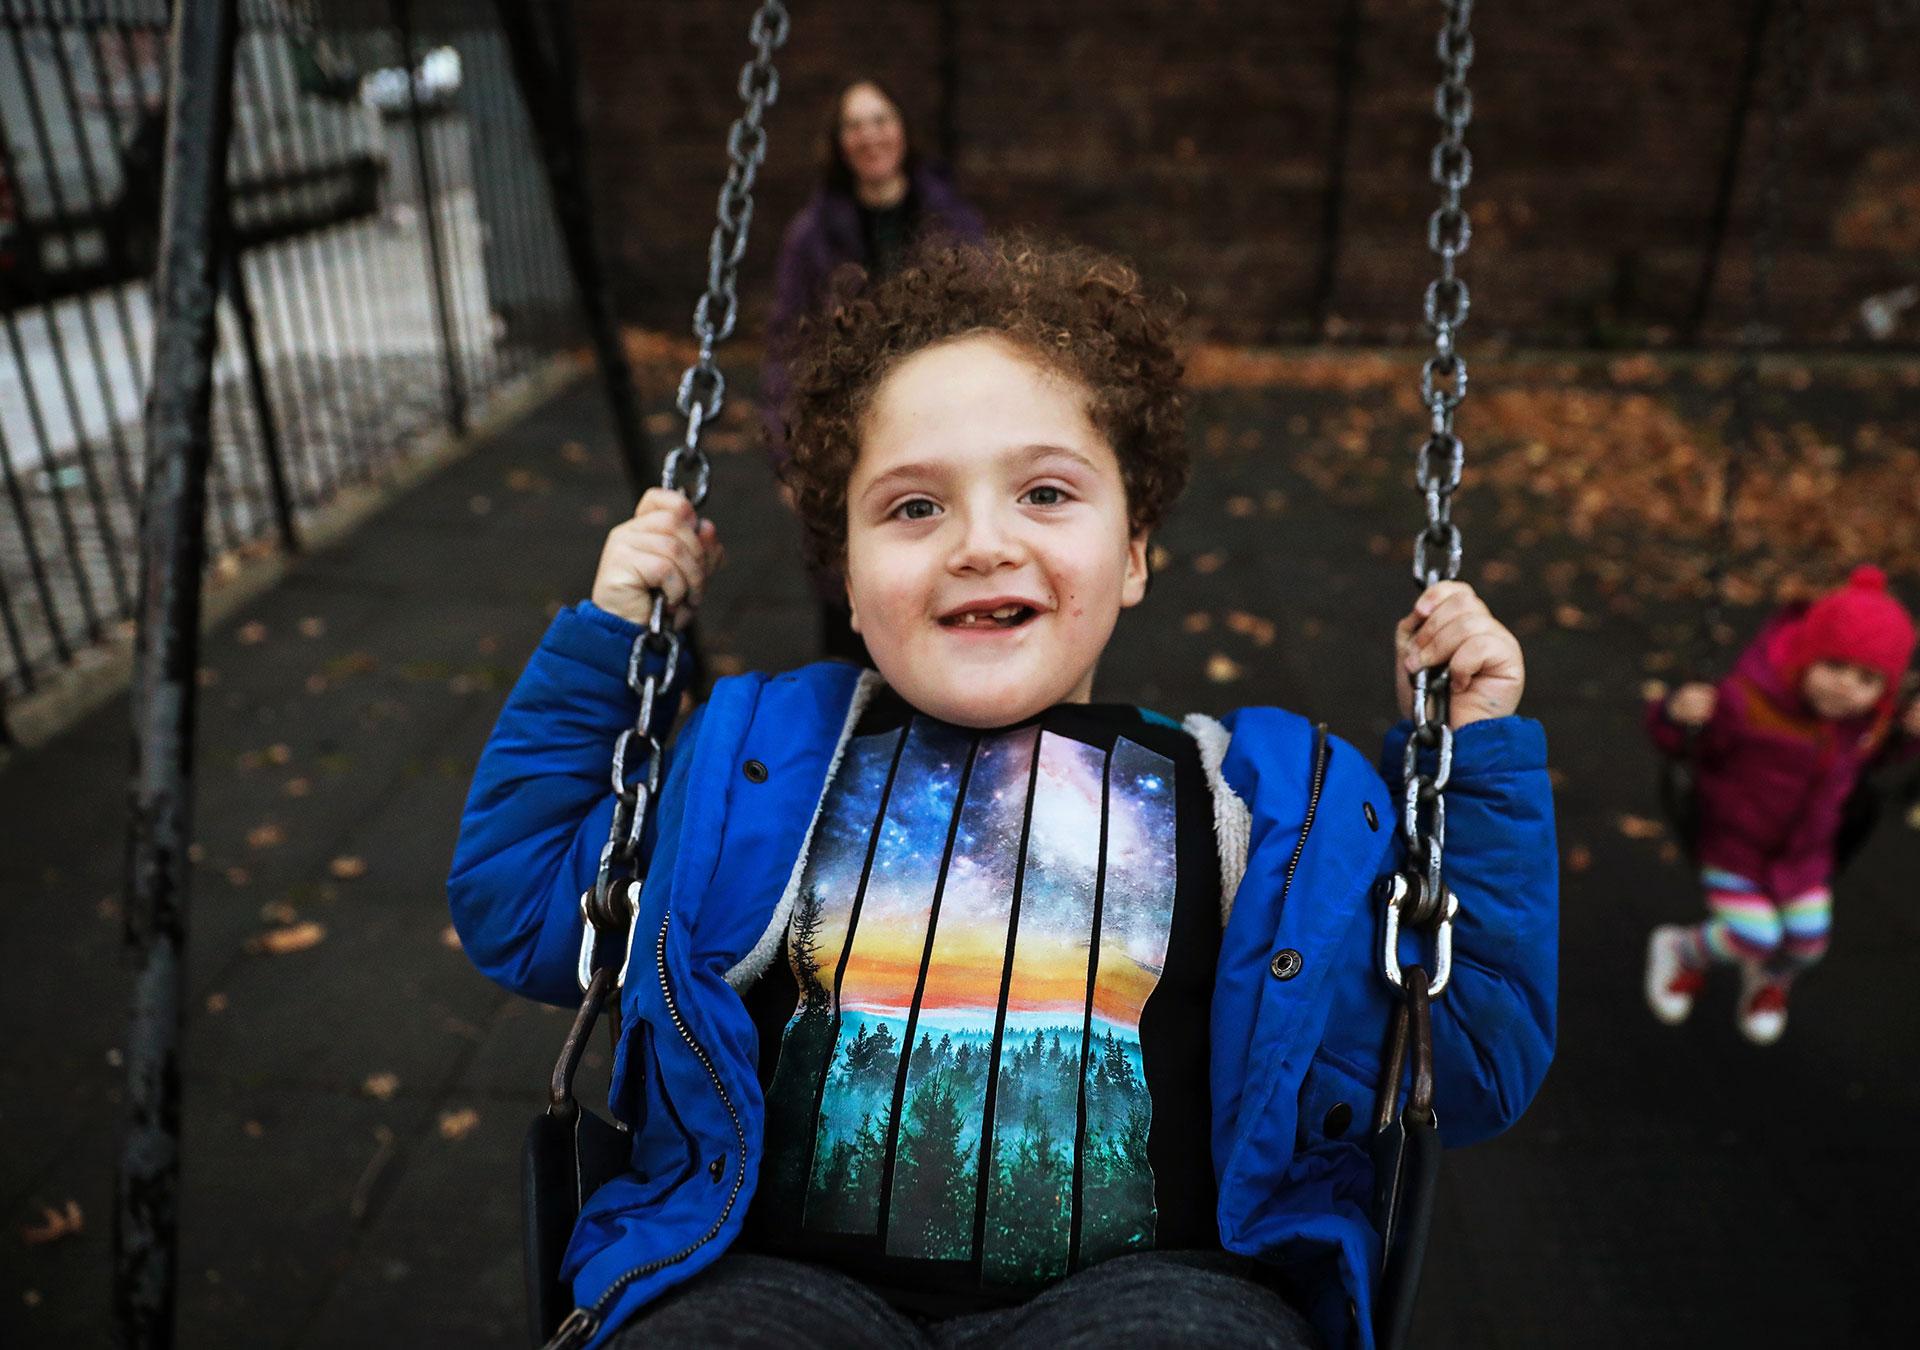 Son's brain tumor diagnosis propels editor to frontiers of medicine